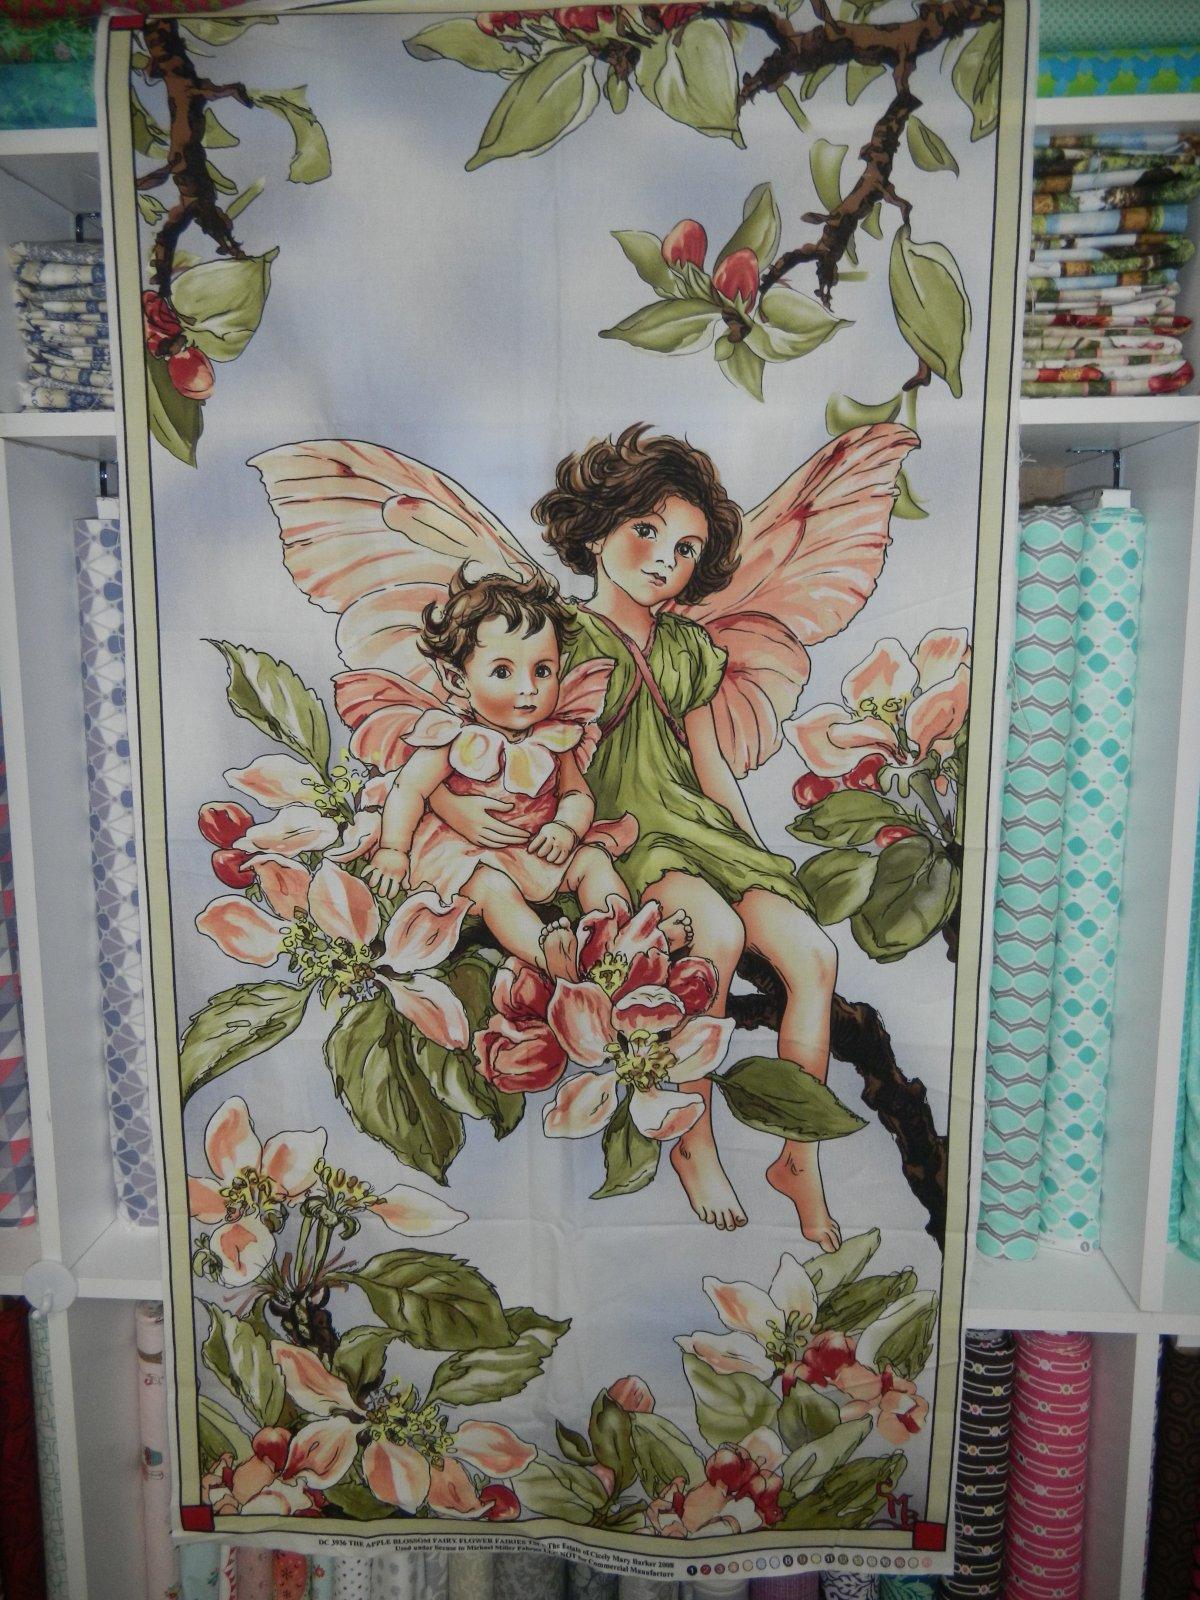 Panel#139 - Apple Blossom Fairy - Floral/Fairy